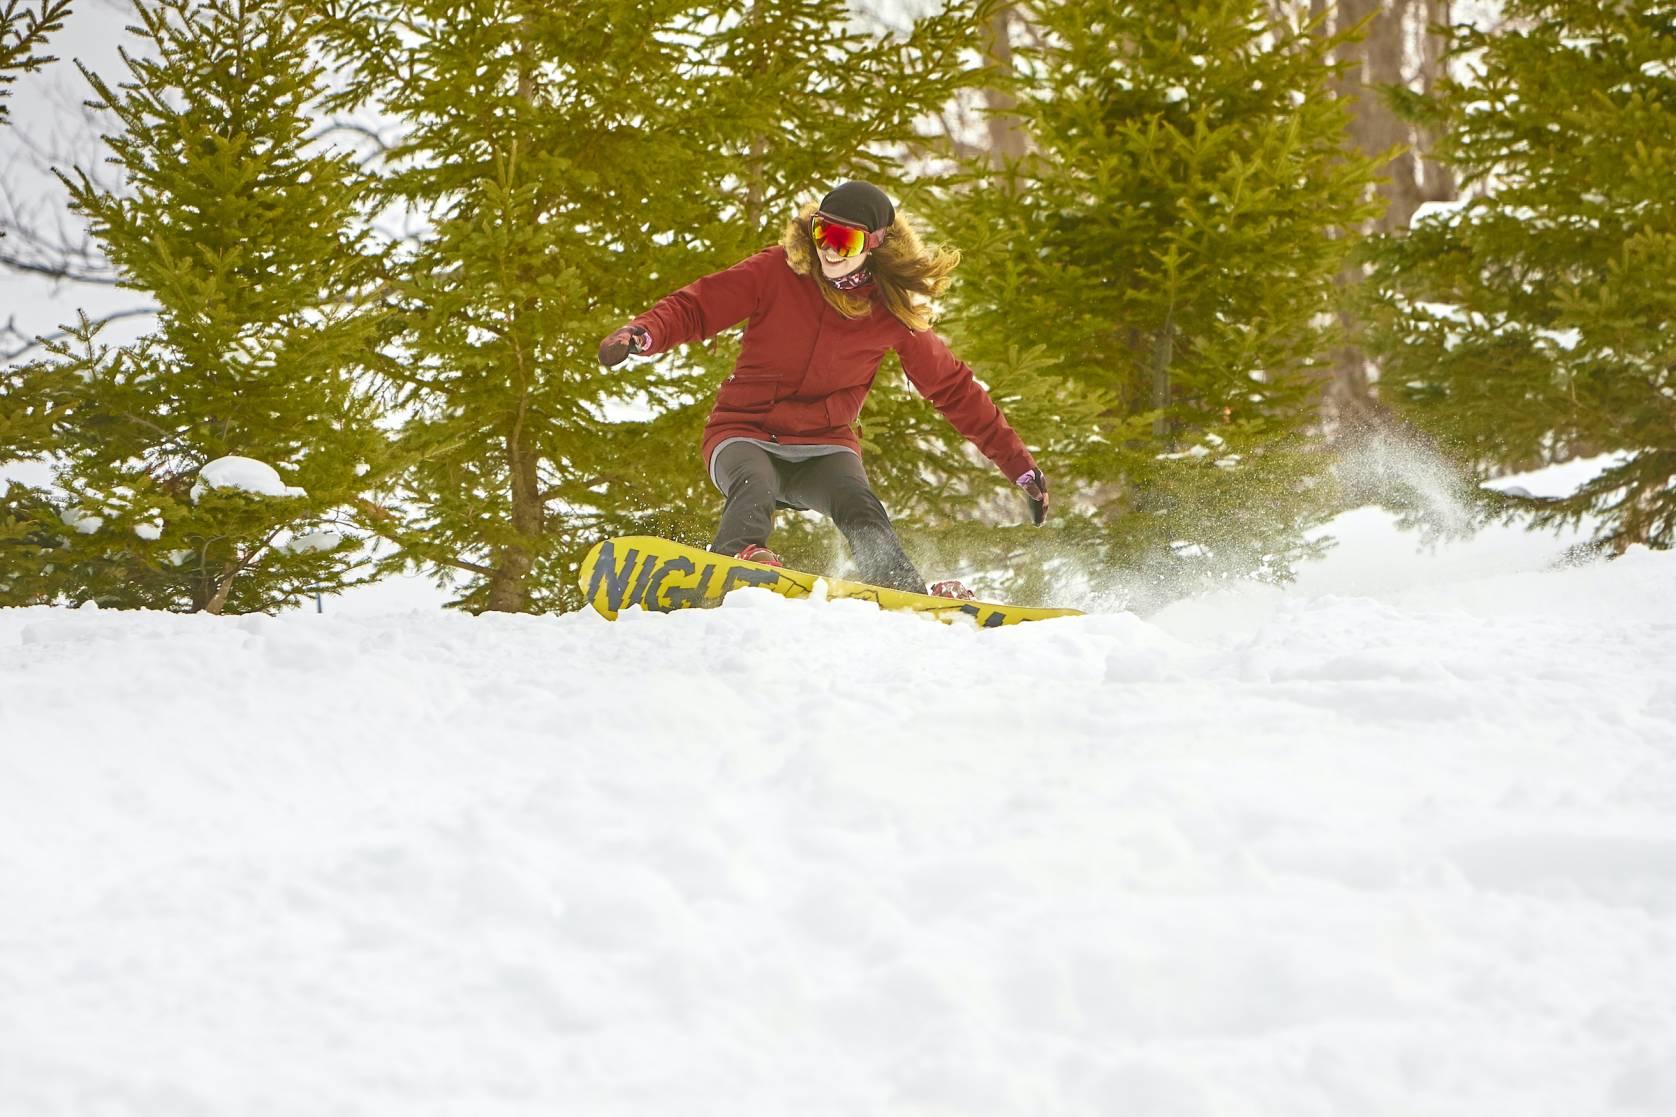 Big Powderhorn ski resort, MI